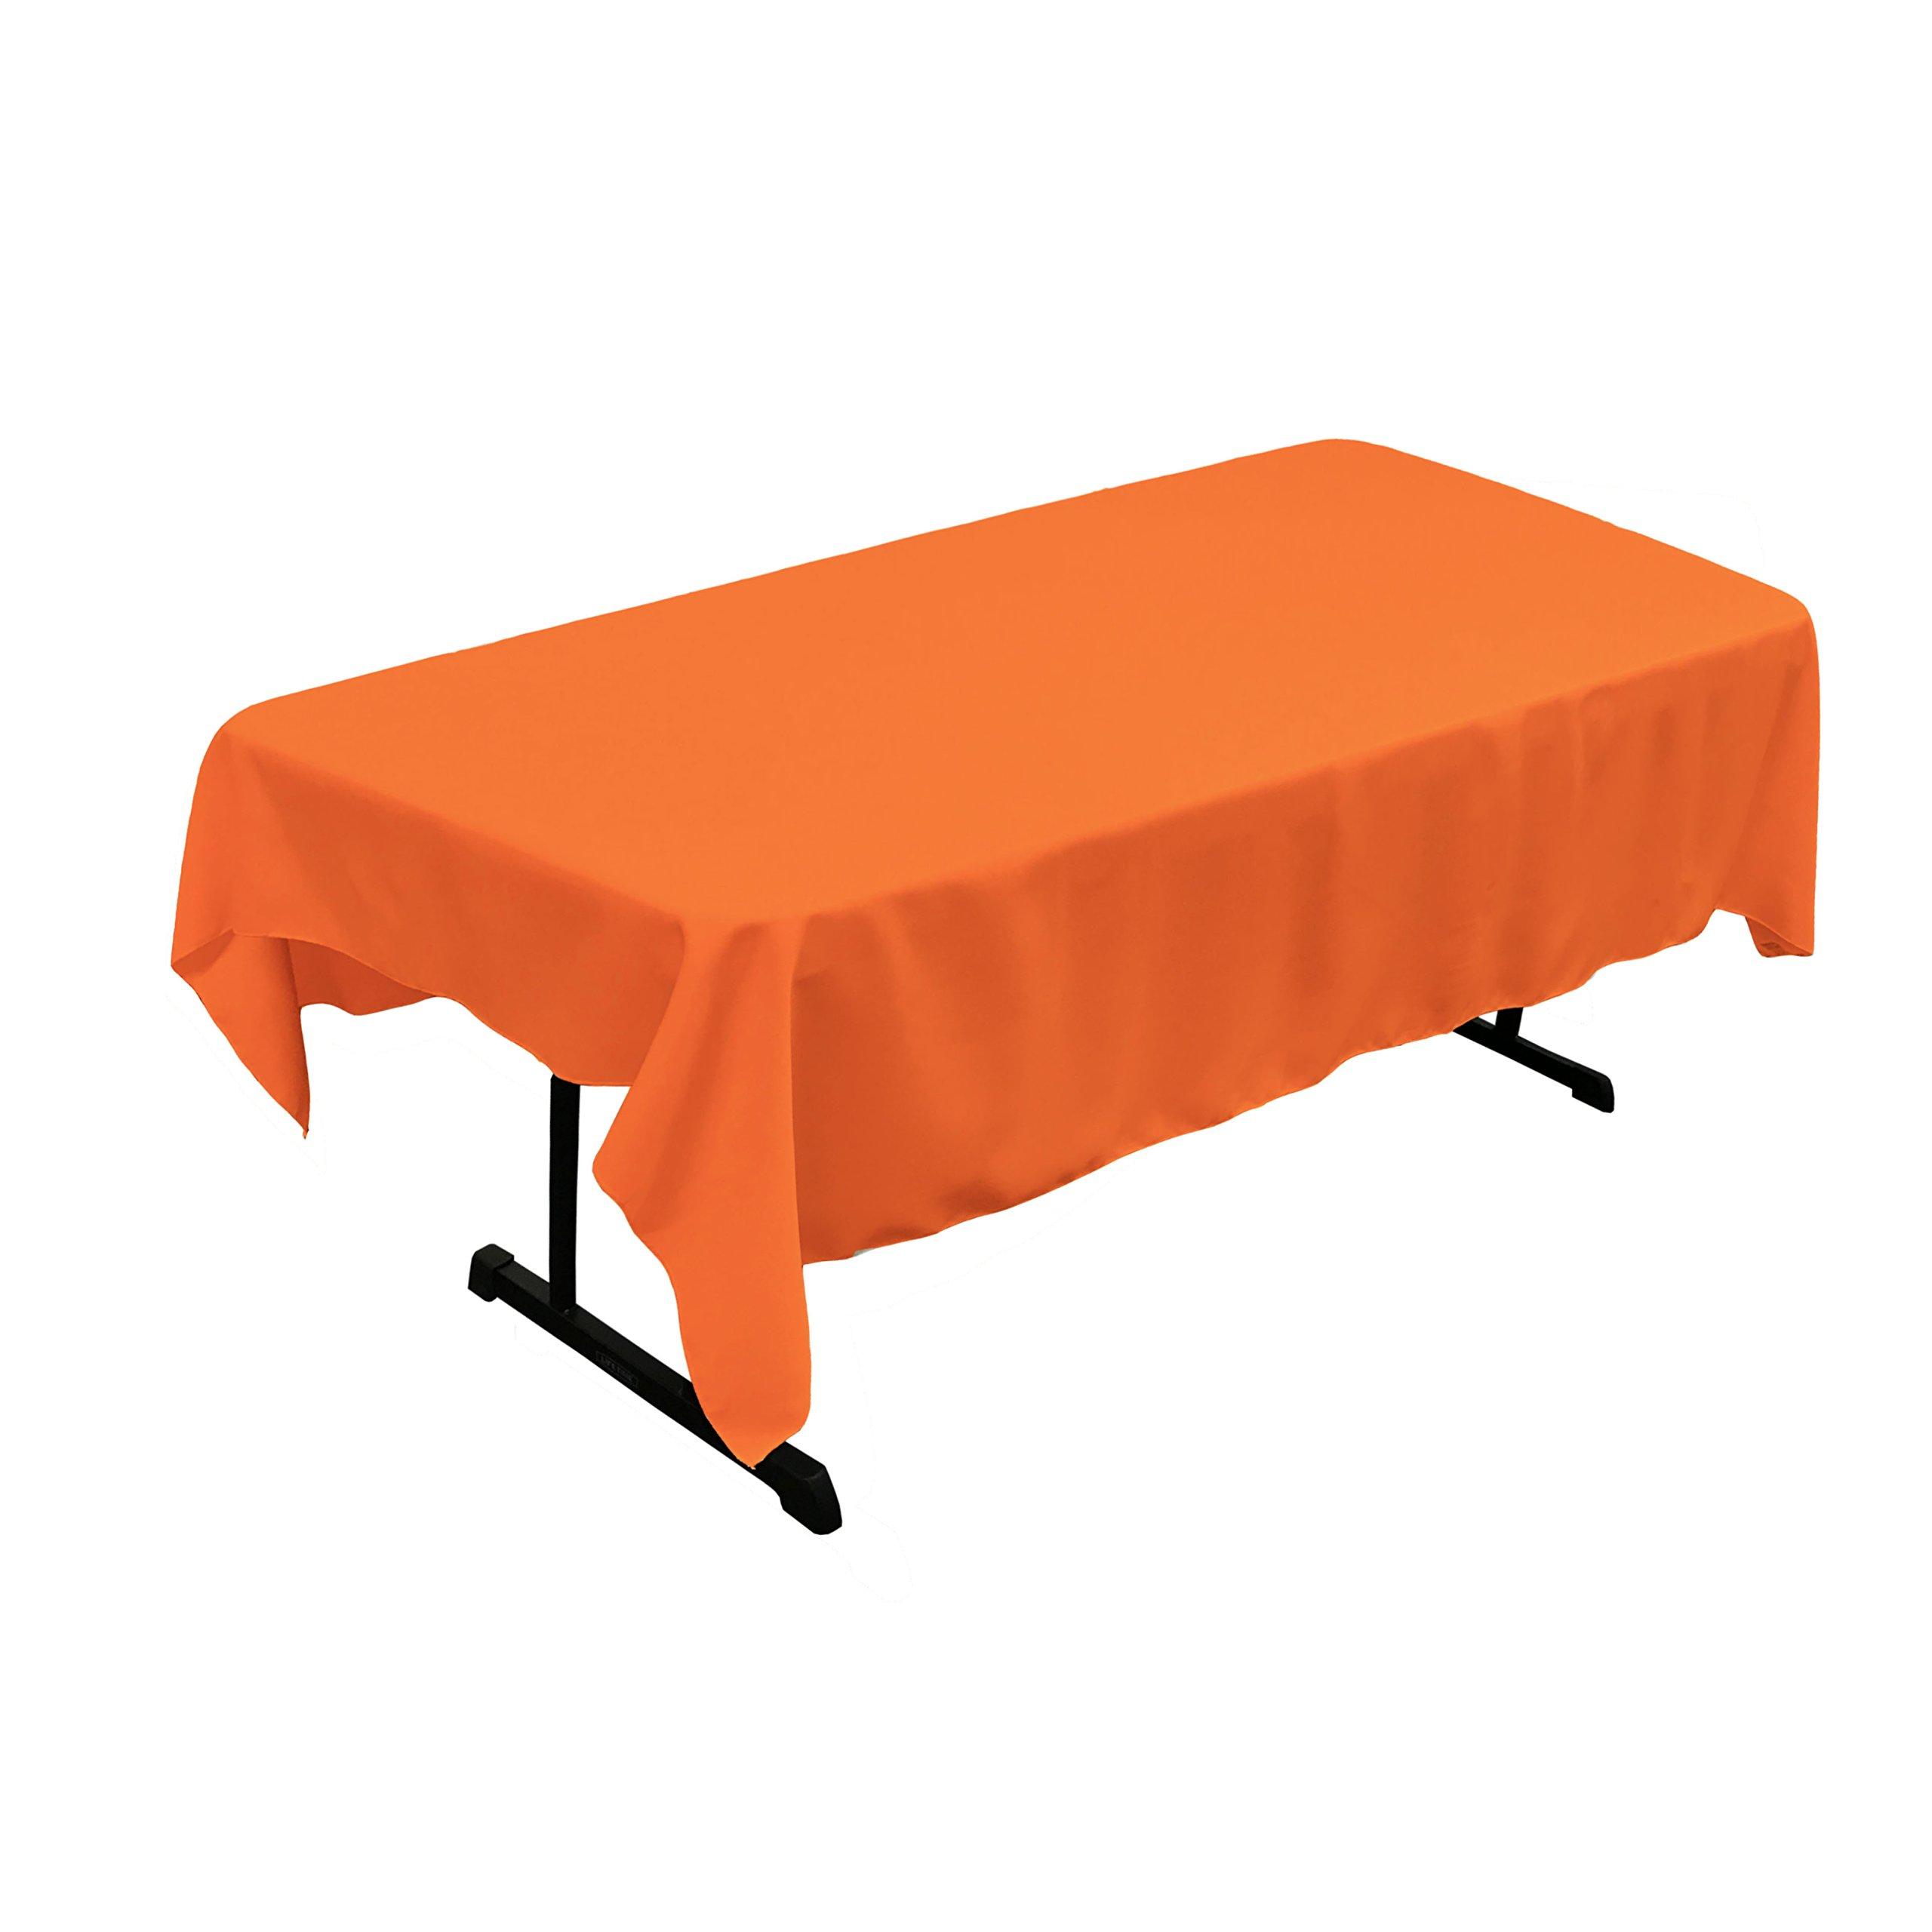 LA Linen Polyester Poplin Rectangular Tablecloth, Orange, 60'' x 84''